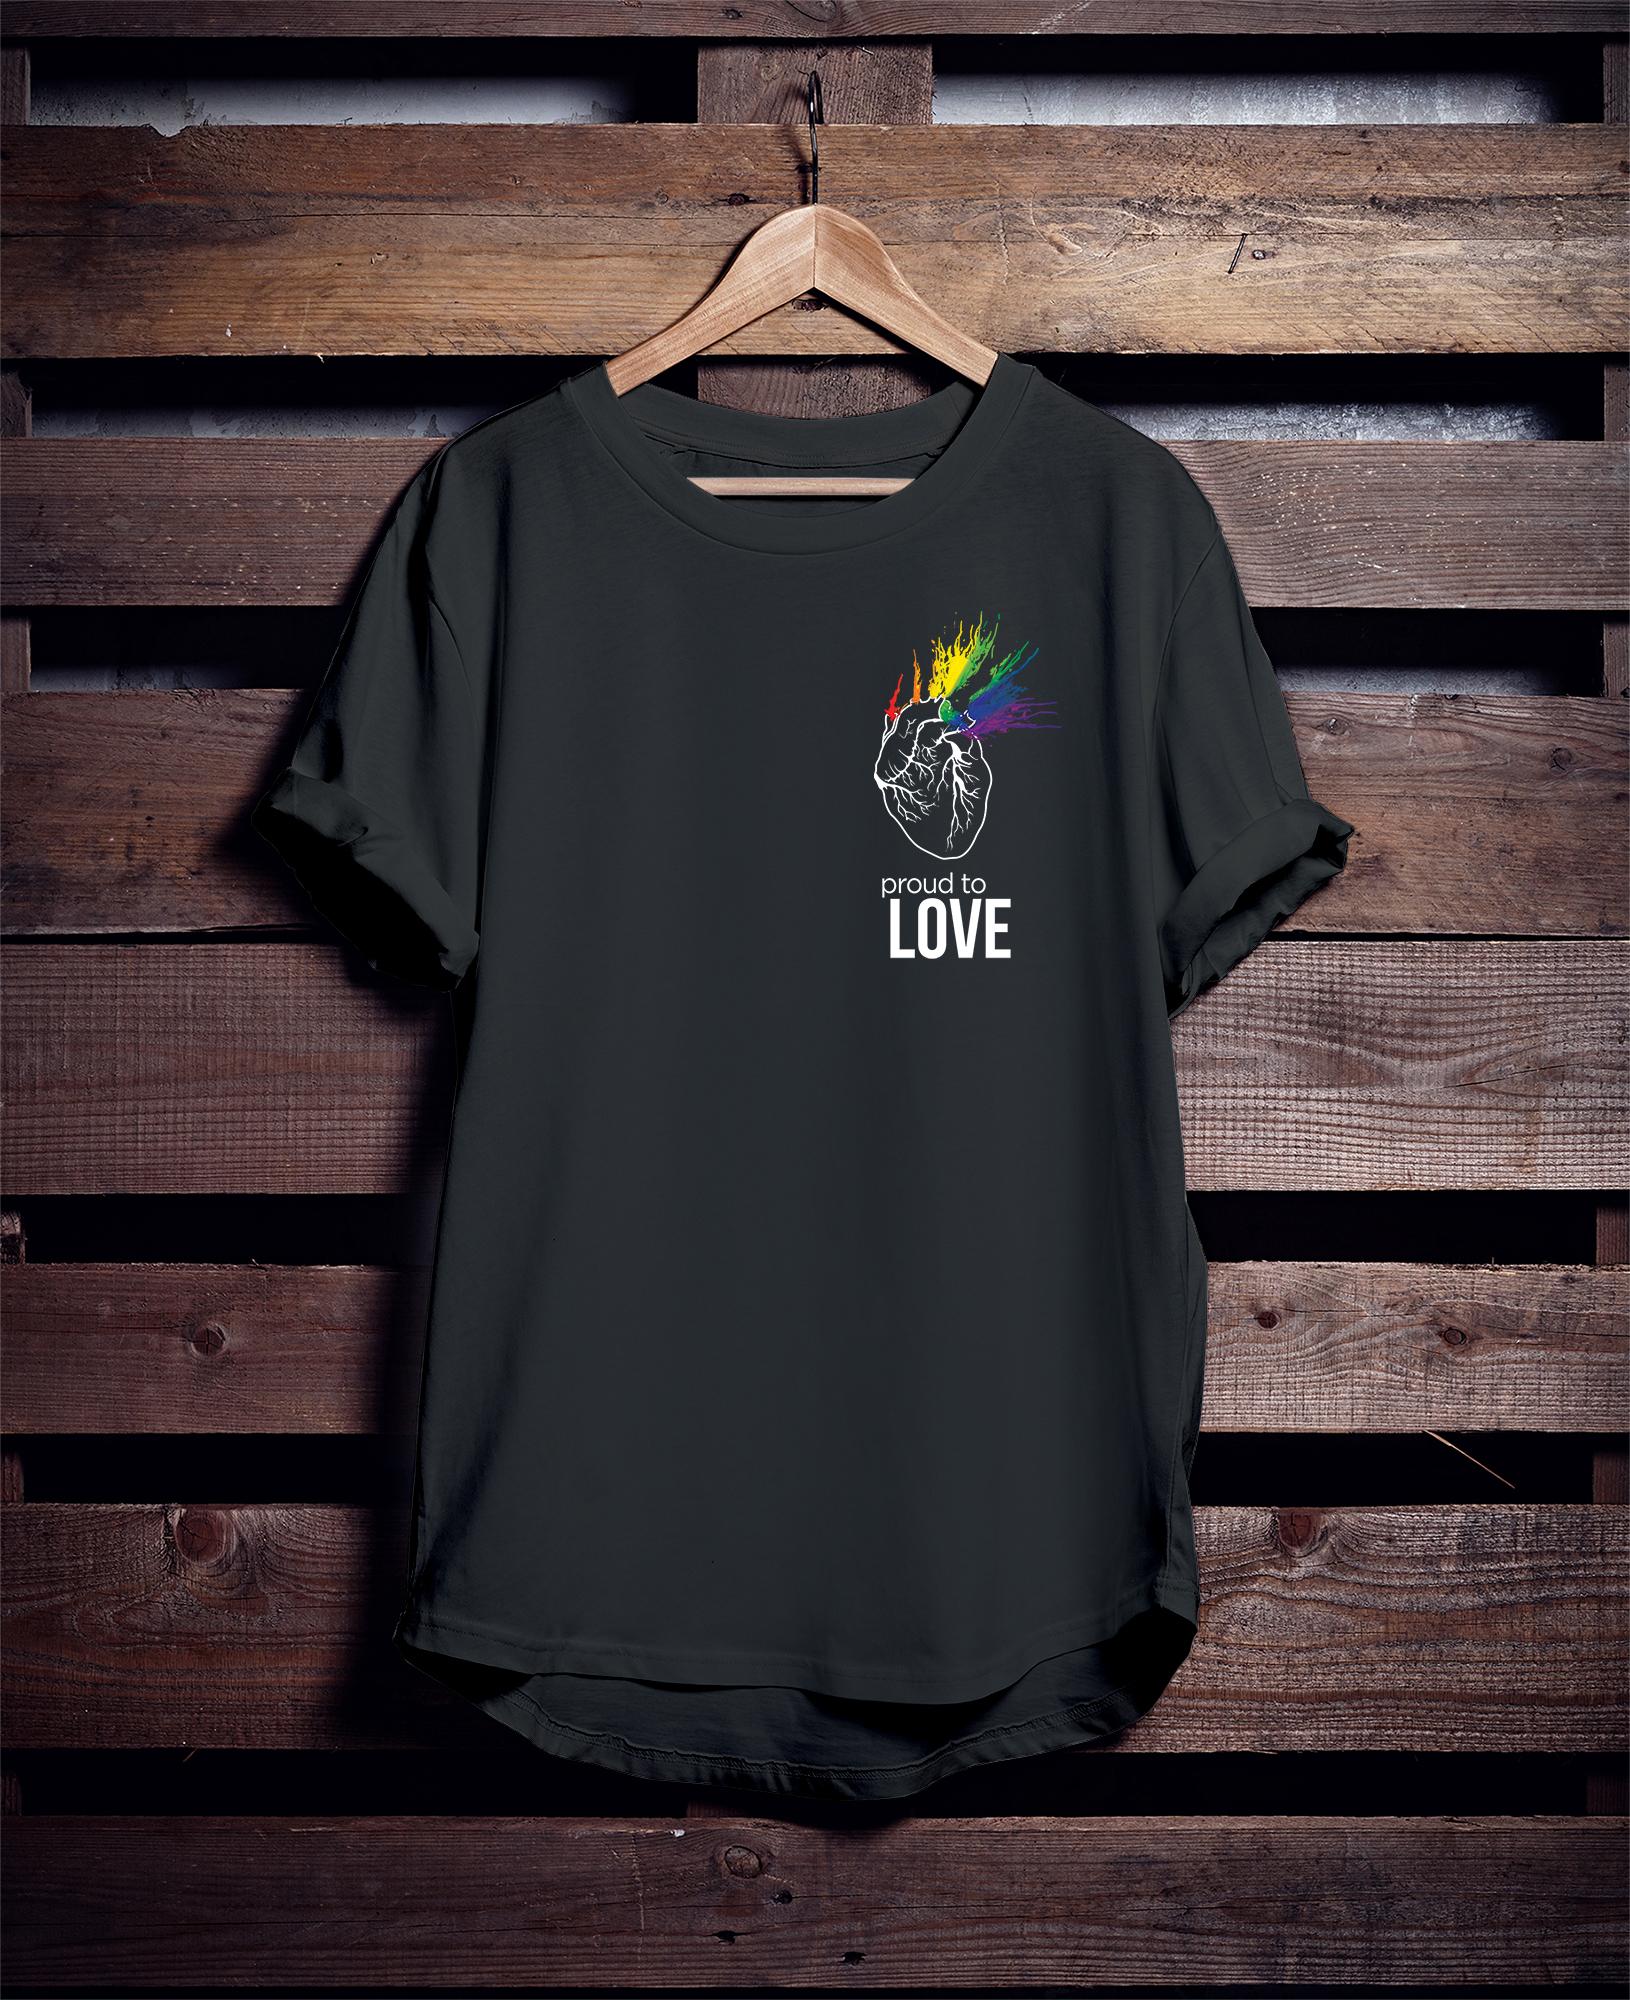 Proud to Love_Hanging T-Shirt Mockup.jpg